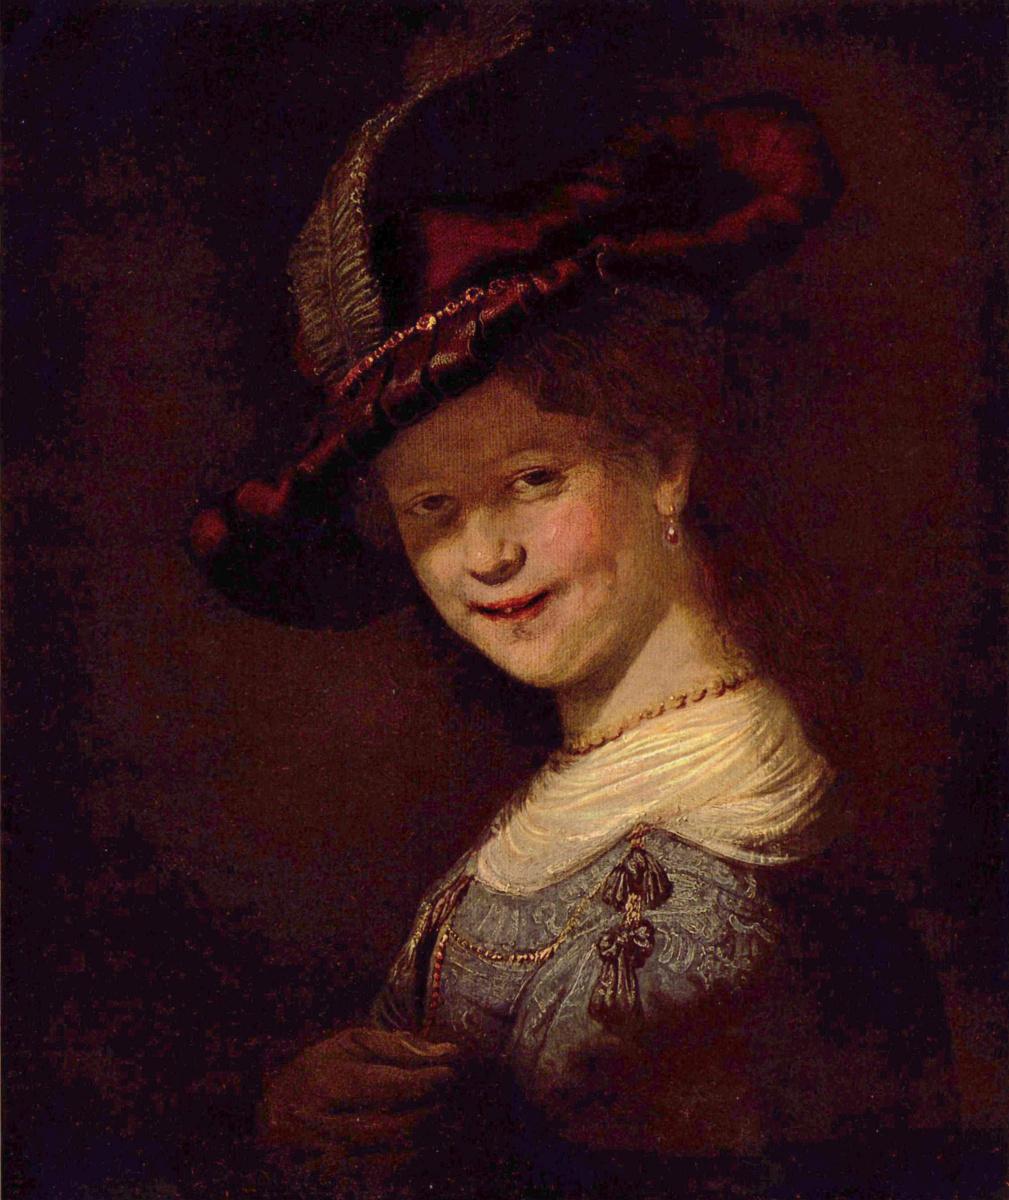 Rembrandt Harmenszoon van Rijn. Portrait of young laughing woman, possibly Saskia van Uylenburg